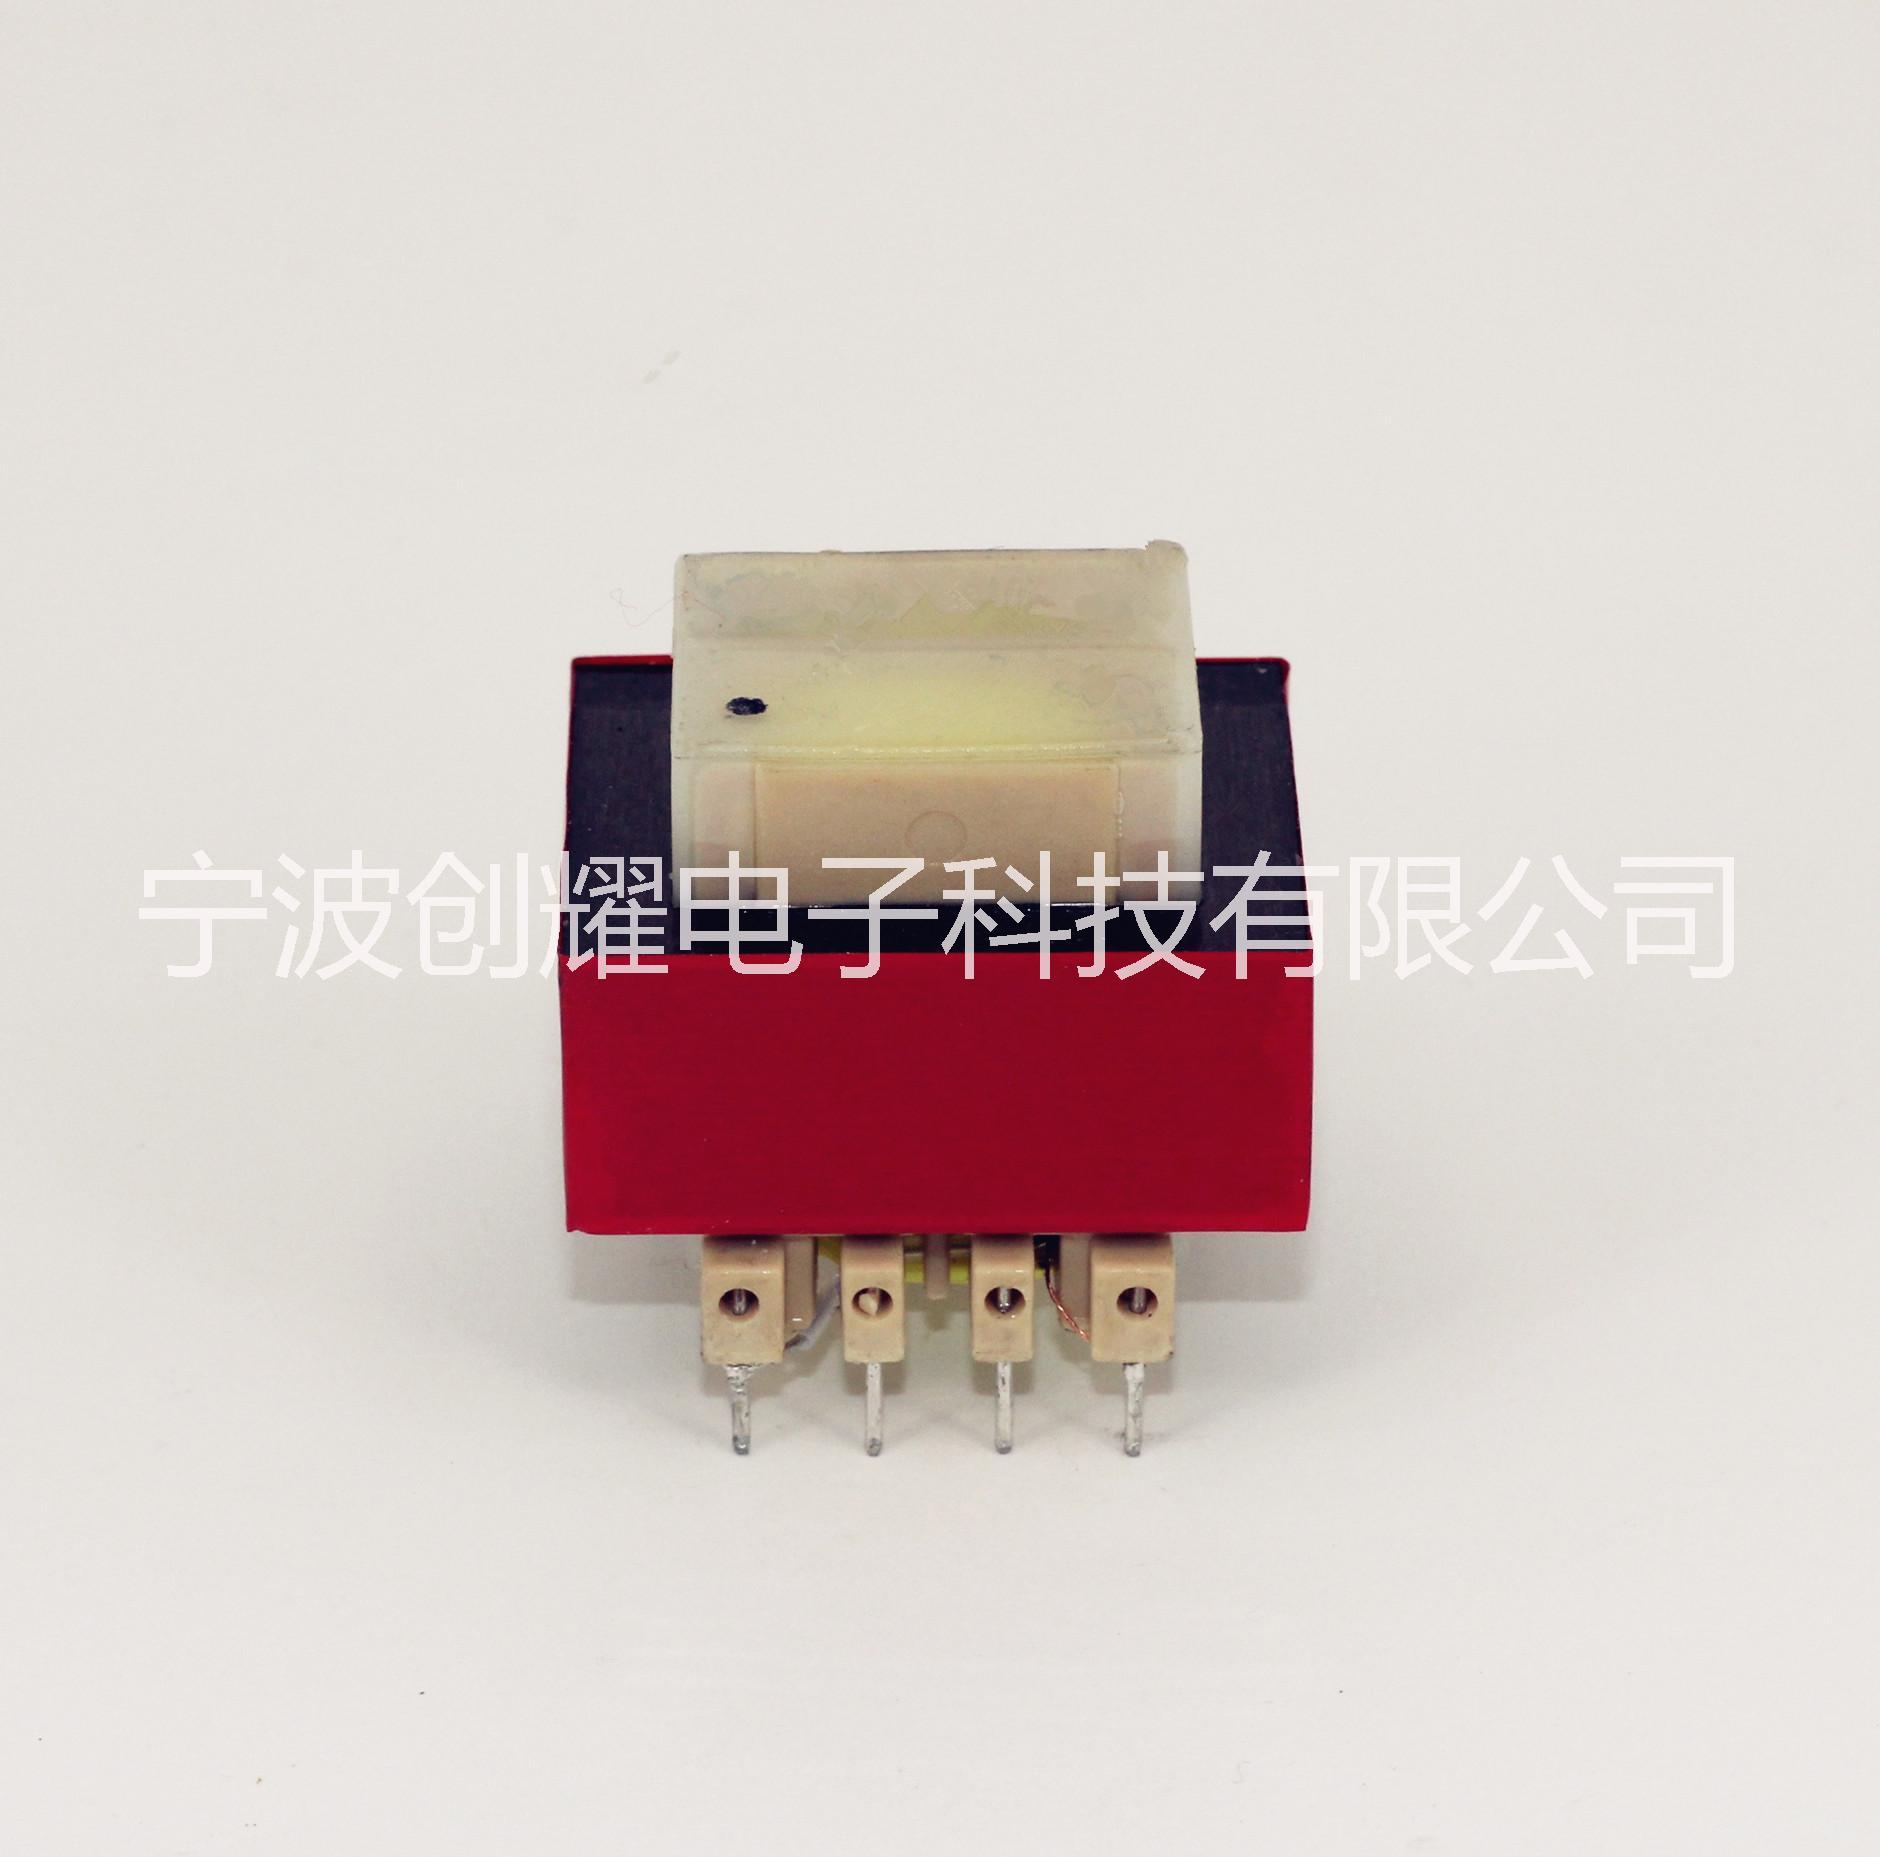 浙江变压器 厂家直销 插针式变压器 EI型变压器 定制变压器 12V变压器 24V变压器